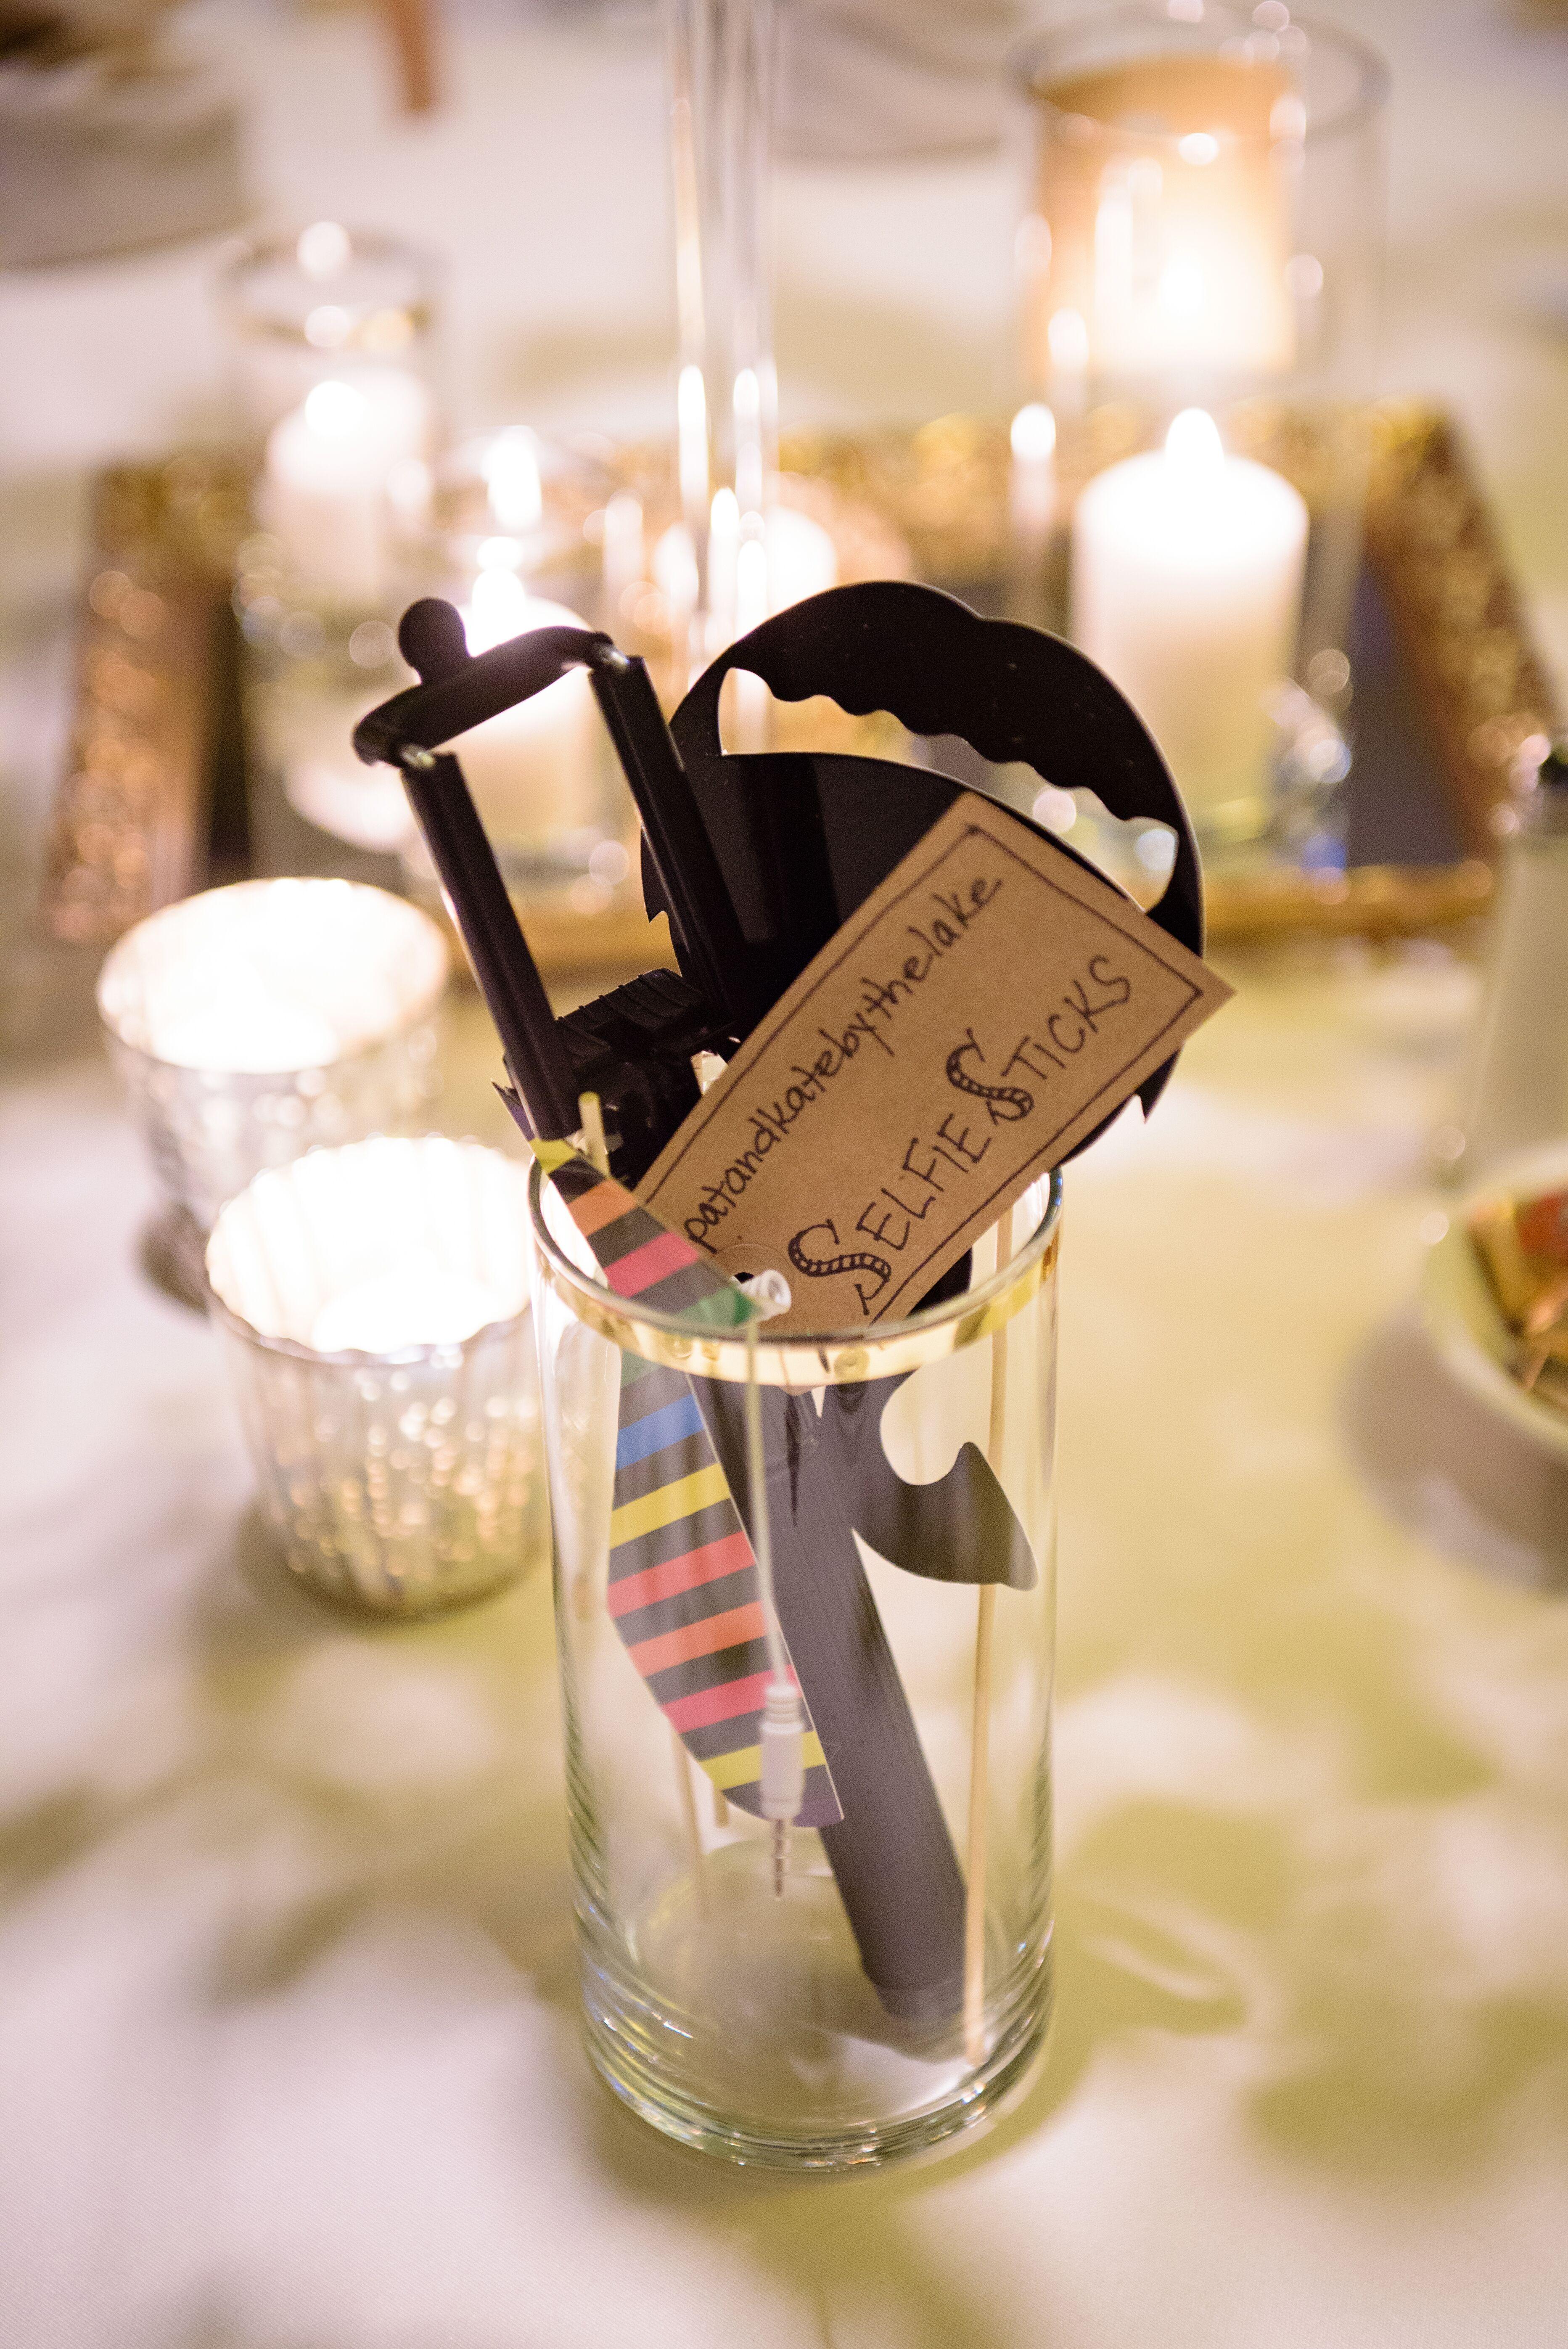 selfie stick wedding photo booth. Black Bedroom Furniture Sets. Home Design Ideas